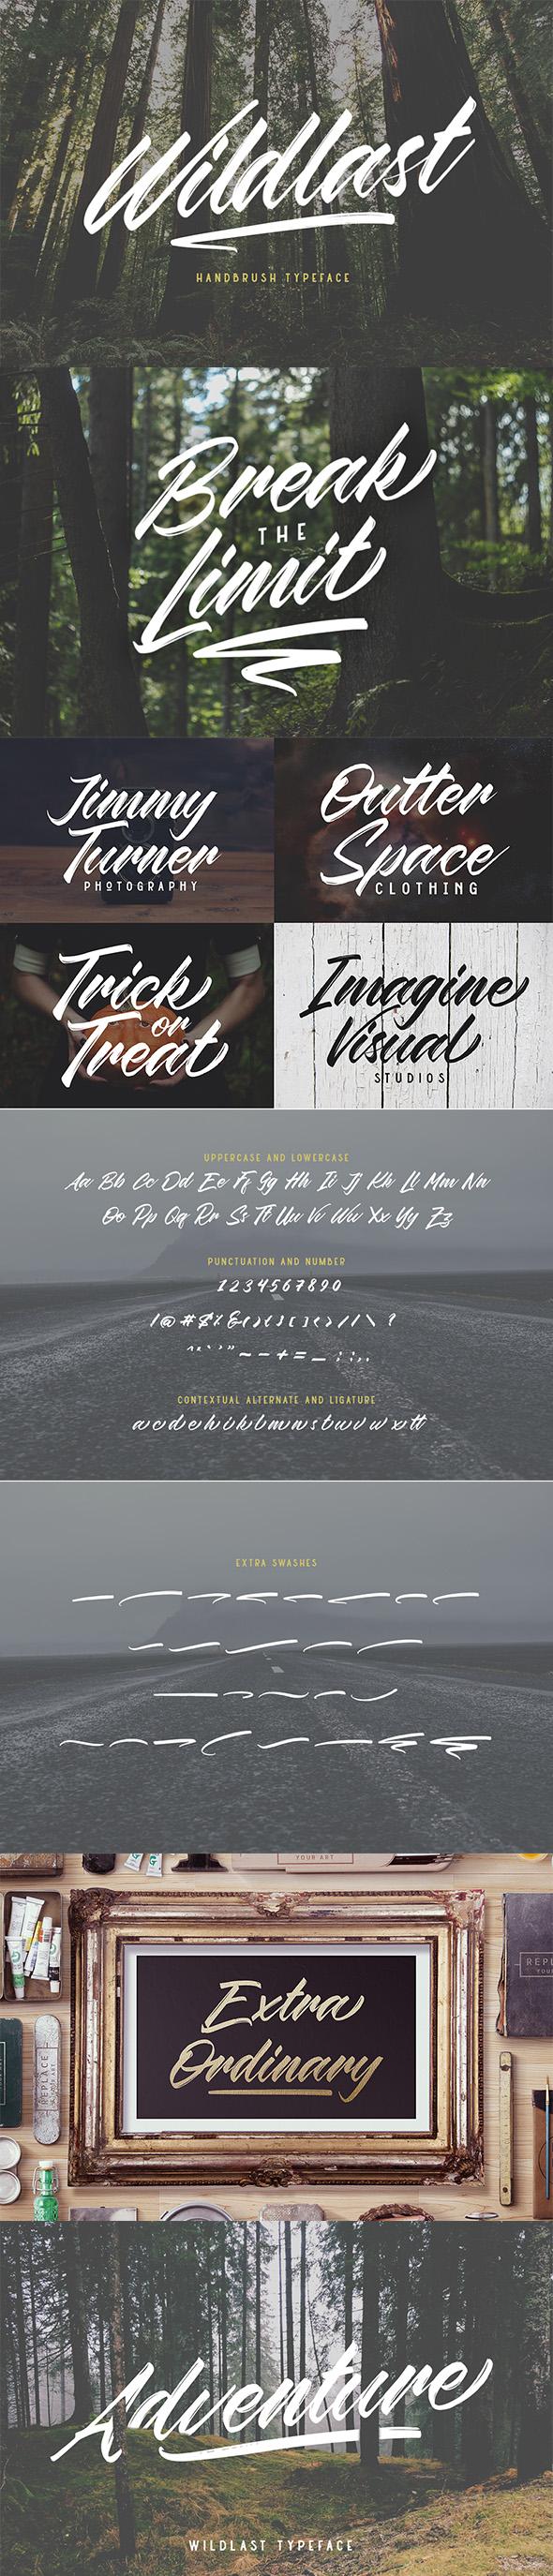 Wildlast Handbrush Typeface - Calligraphy Script